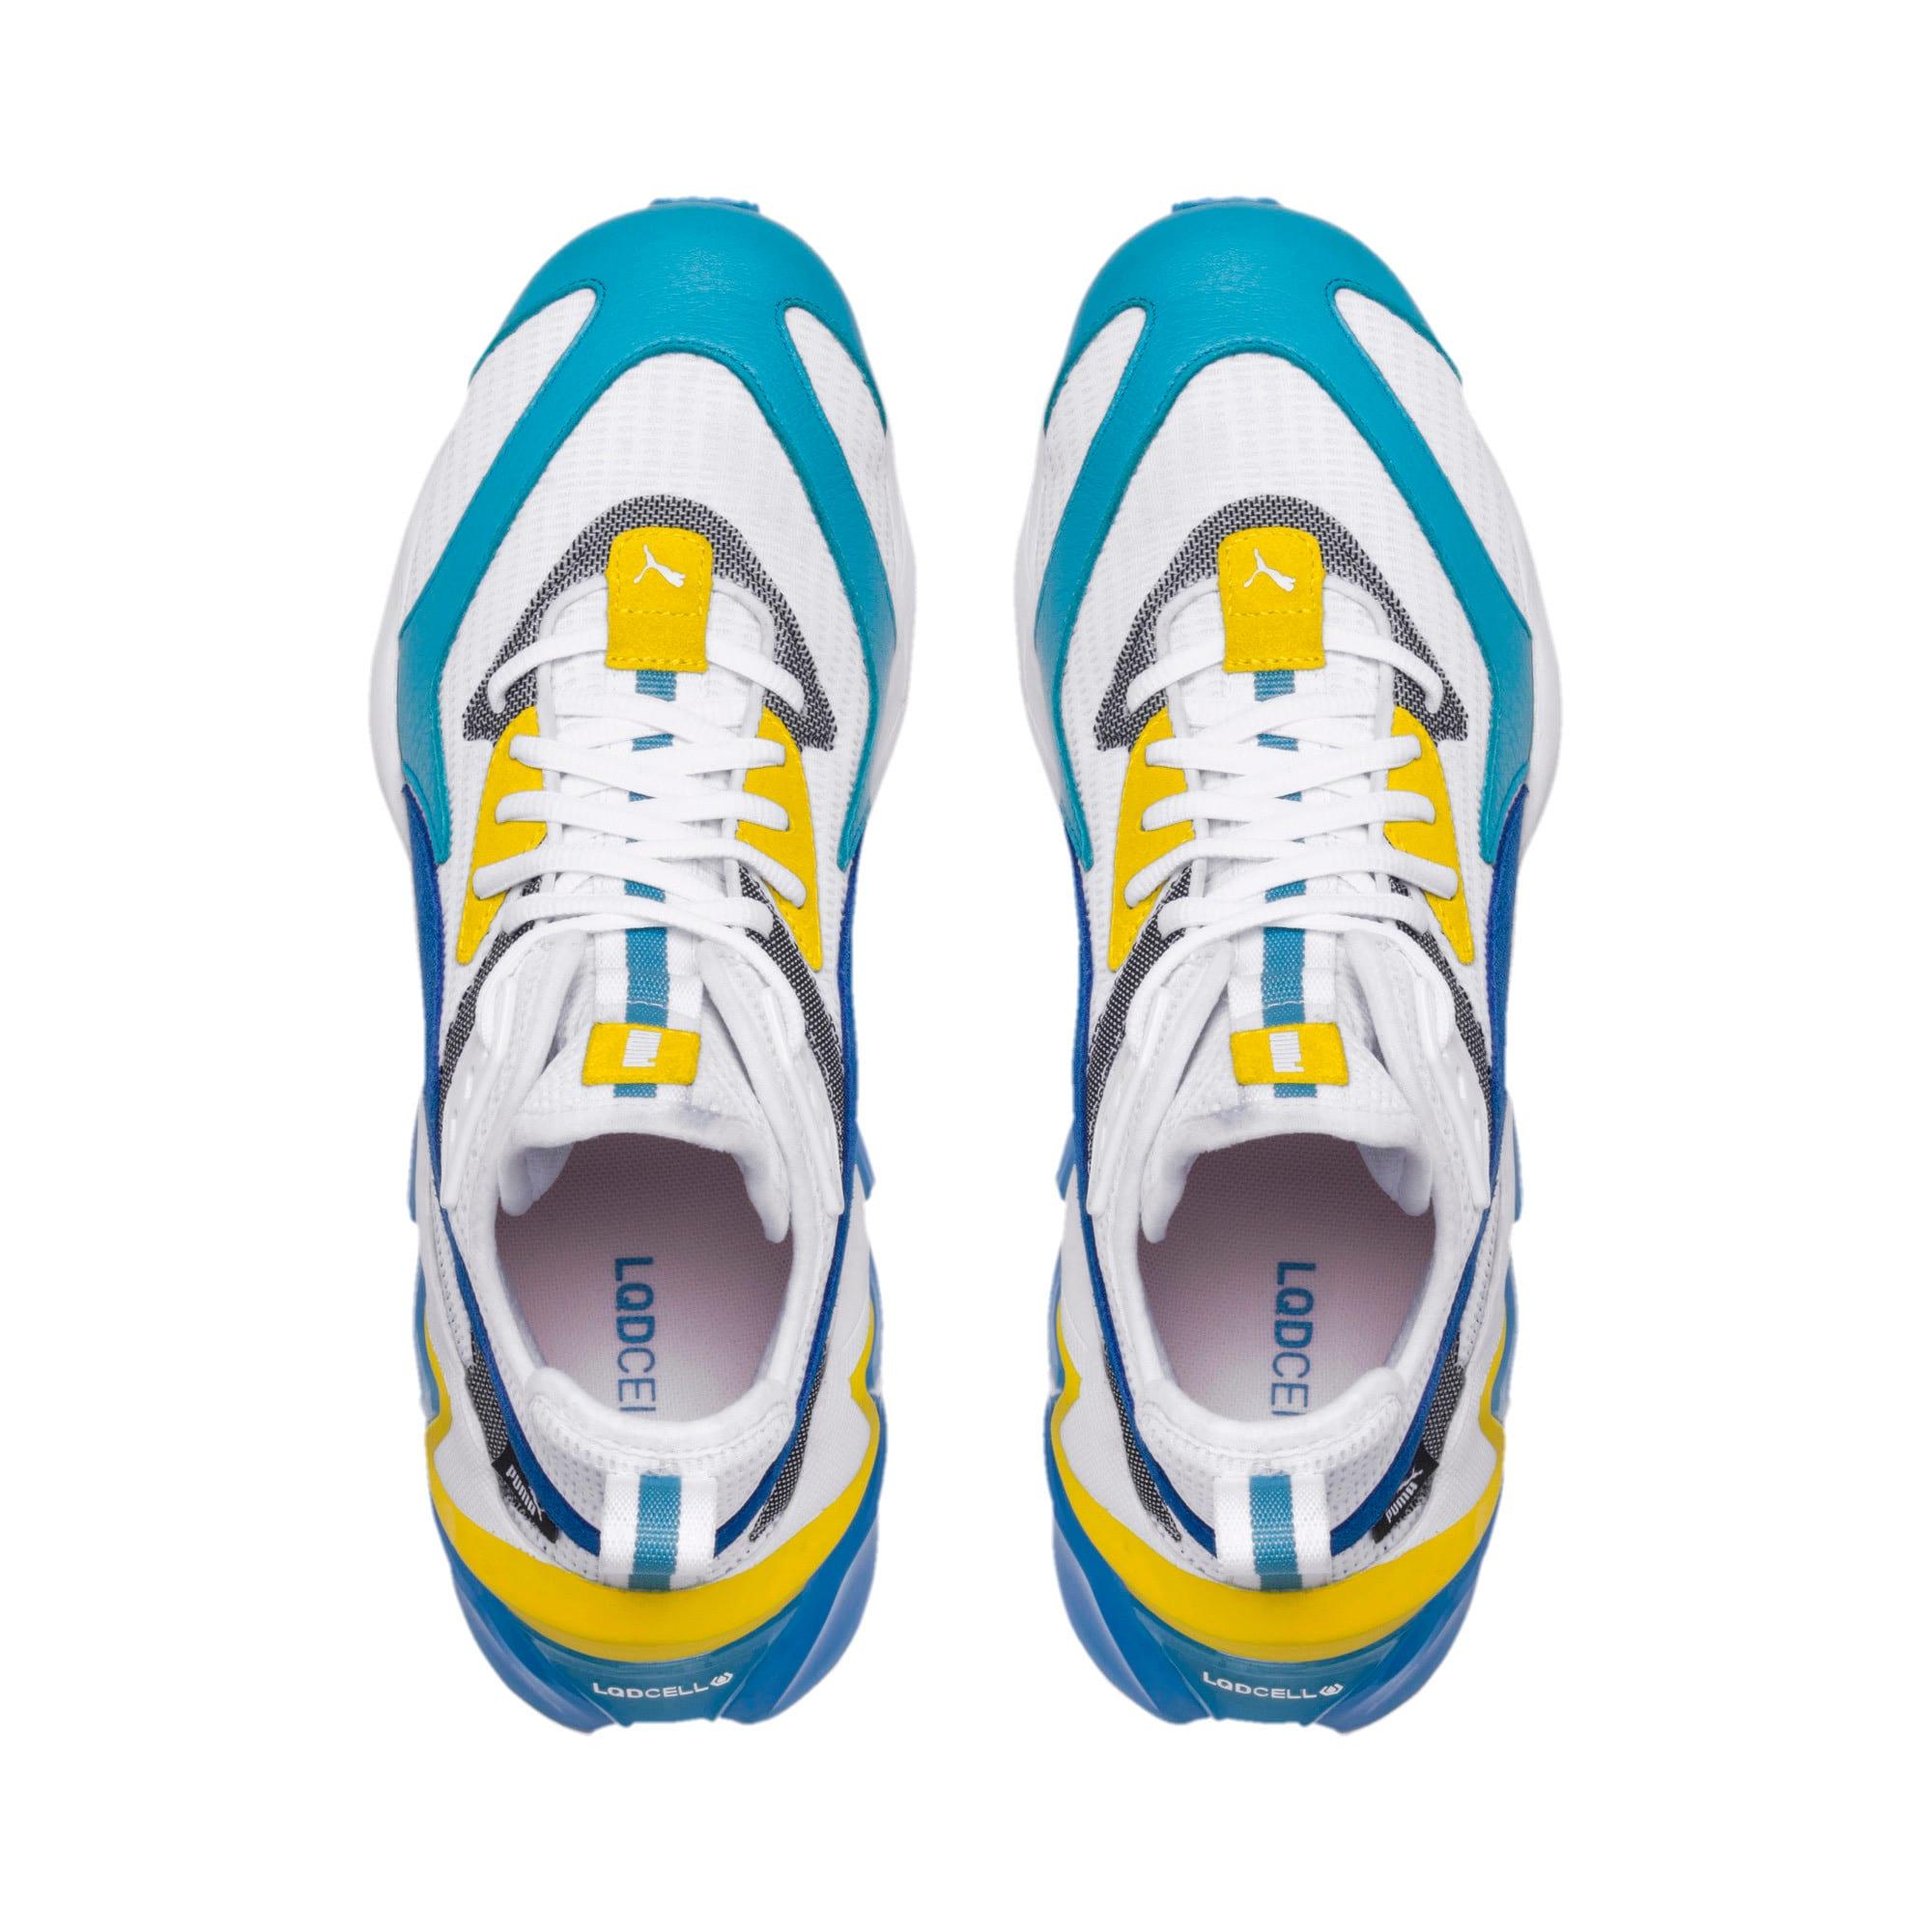 Thumbnail 6 of LQDCELL Origin Men's Training Shoes, Puma White-B Blue-Blz Yellow, medium